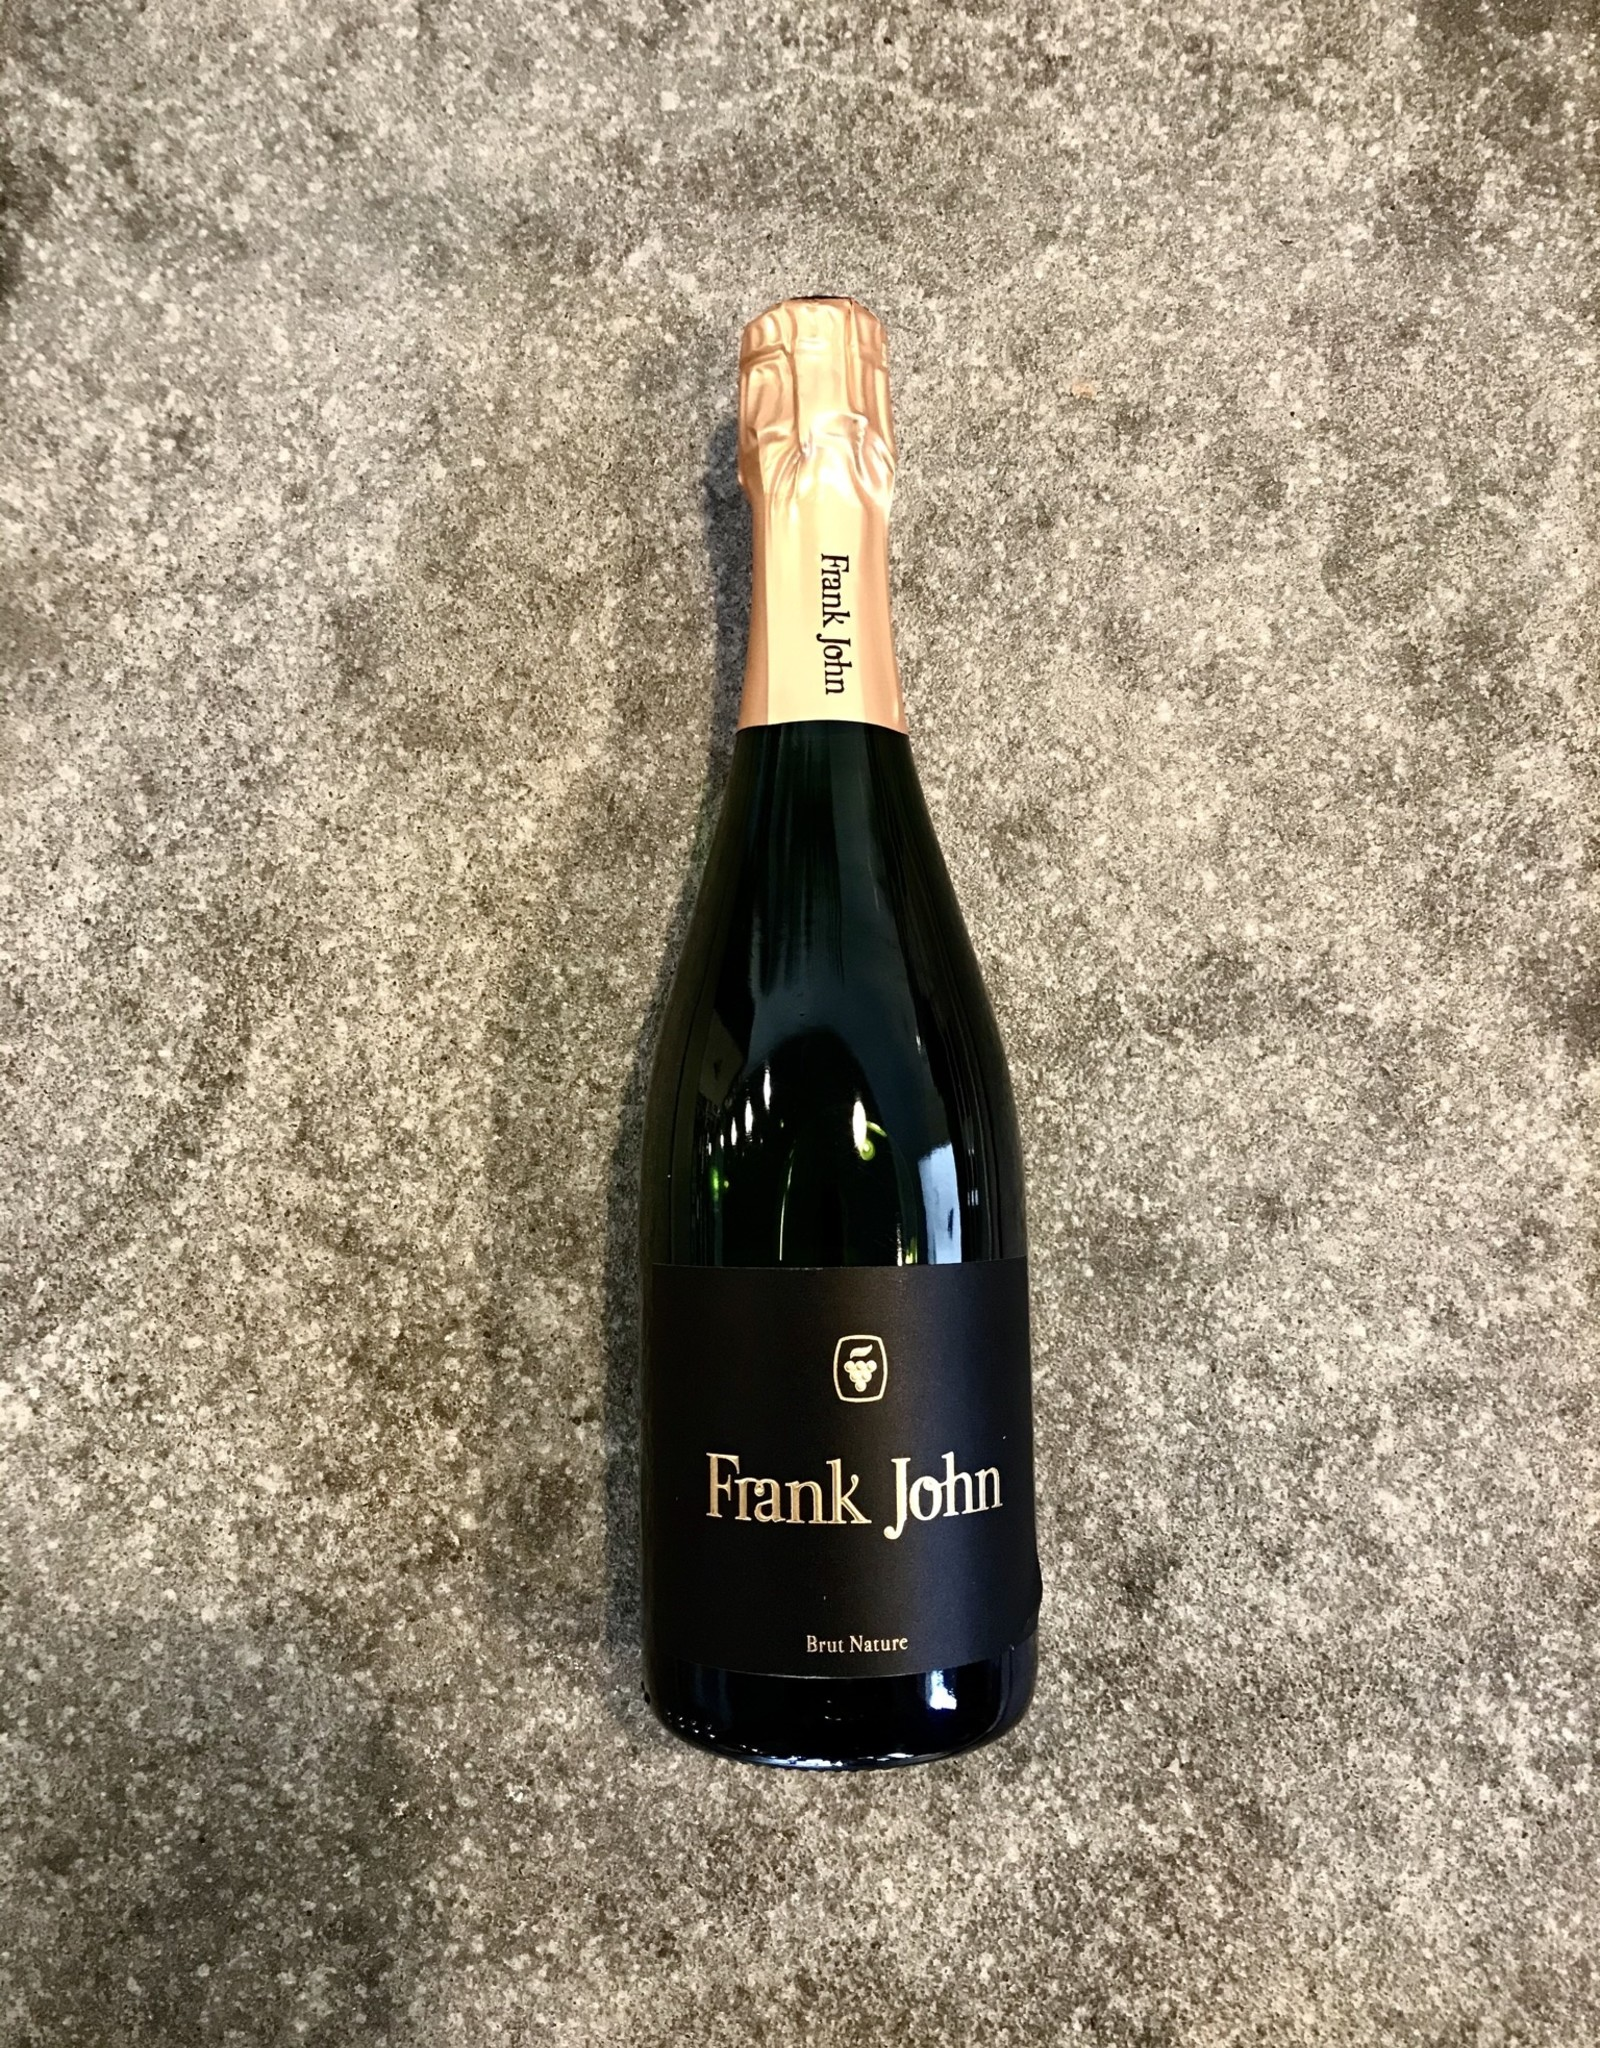 Frank John RIesling Brut Nature 32